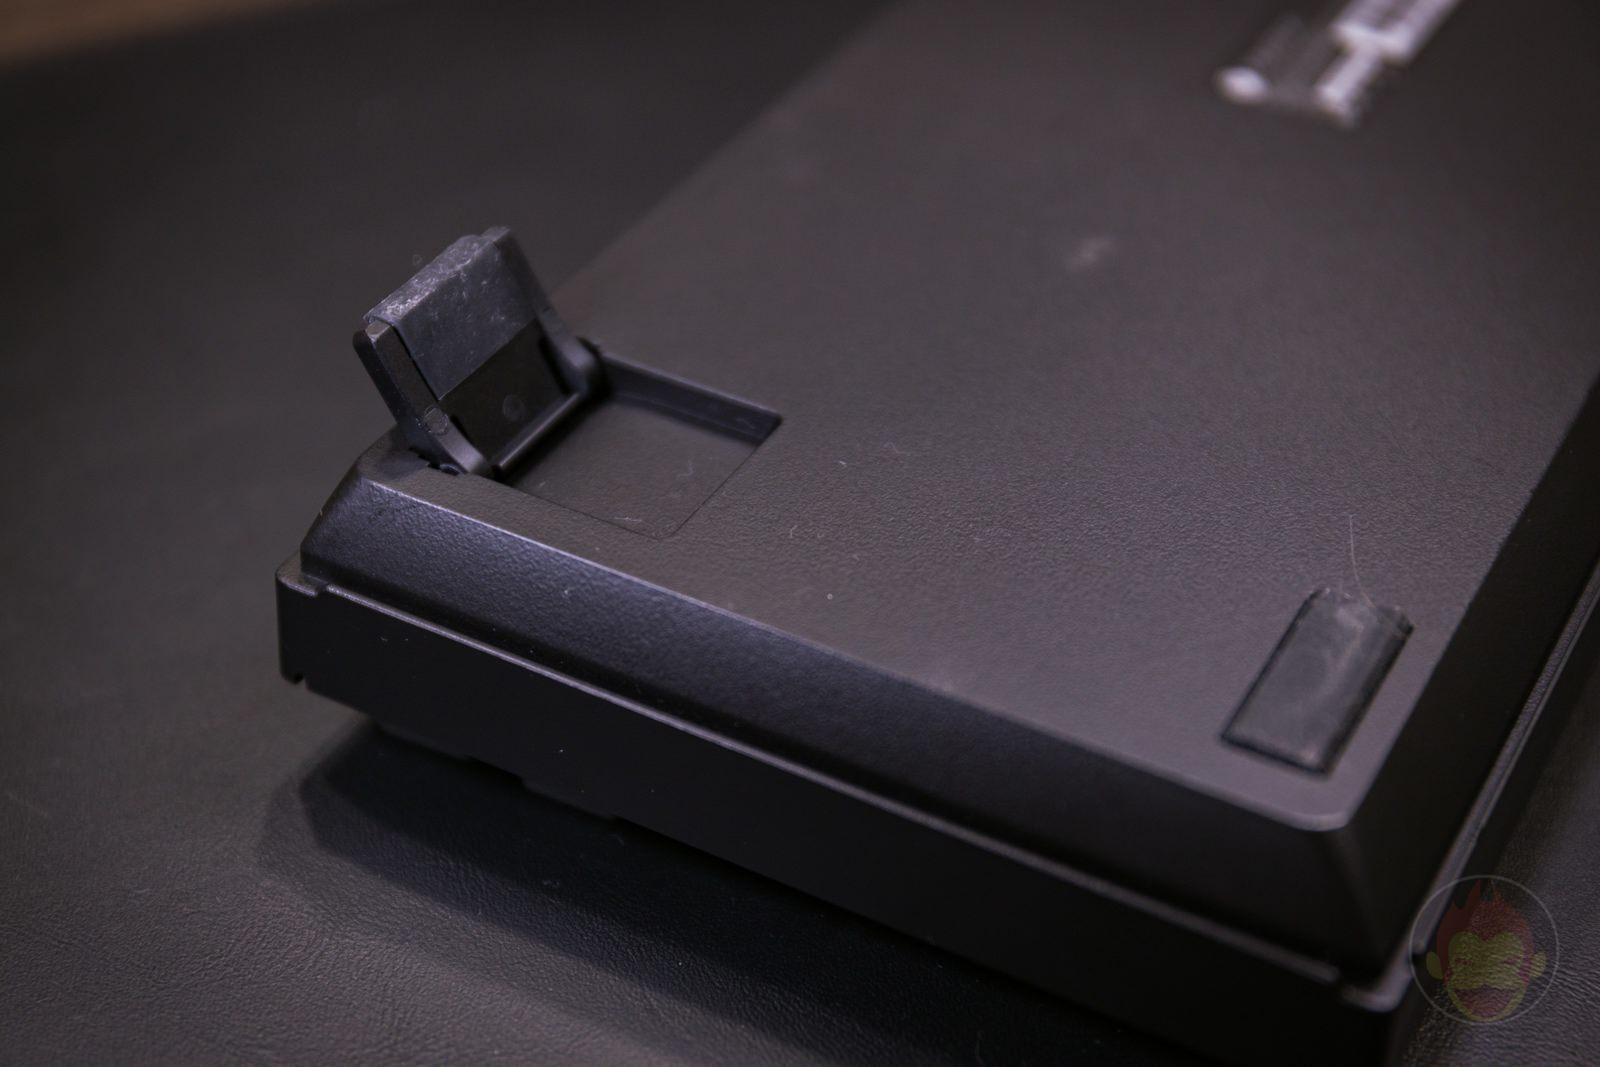 Keychron K2 Mechanical Keyboard Review 05